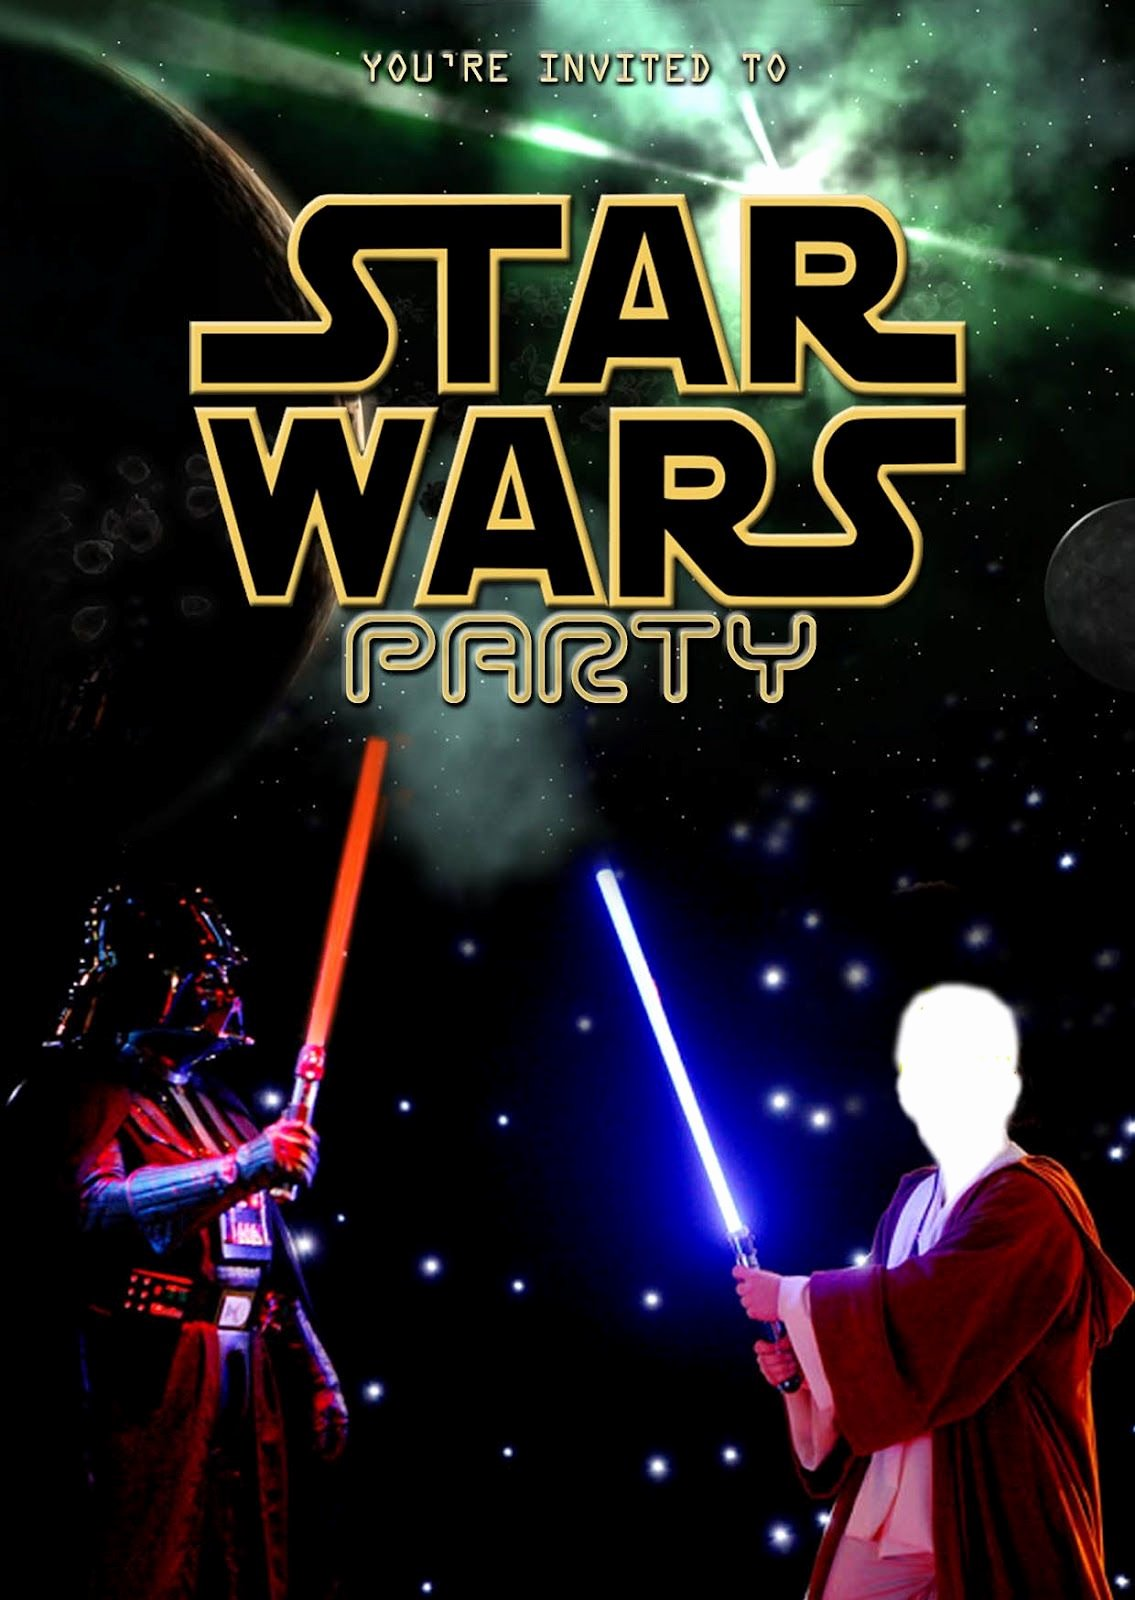 Star Wars Birthday Party Invitations Best Of Free Kids Party Invitations Star Wars Party Invitation New Boy Birthday Parties